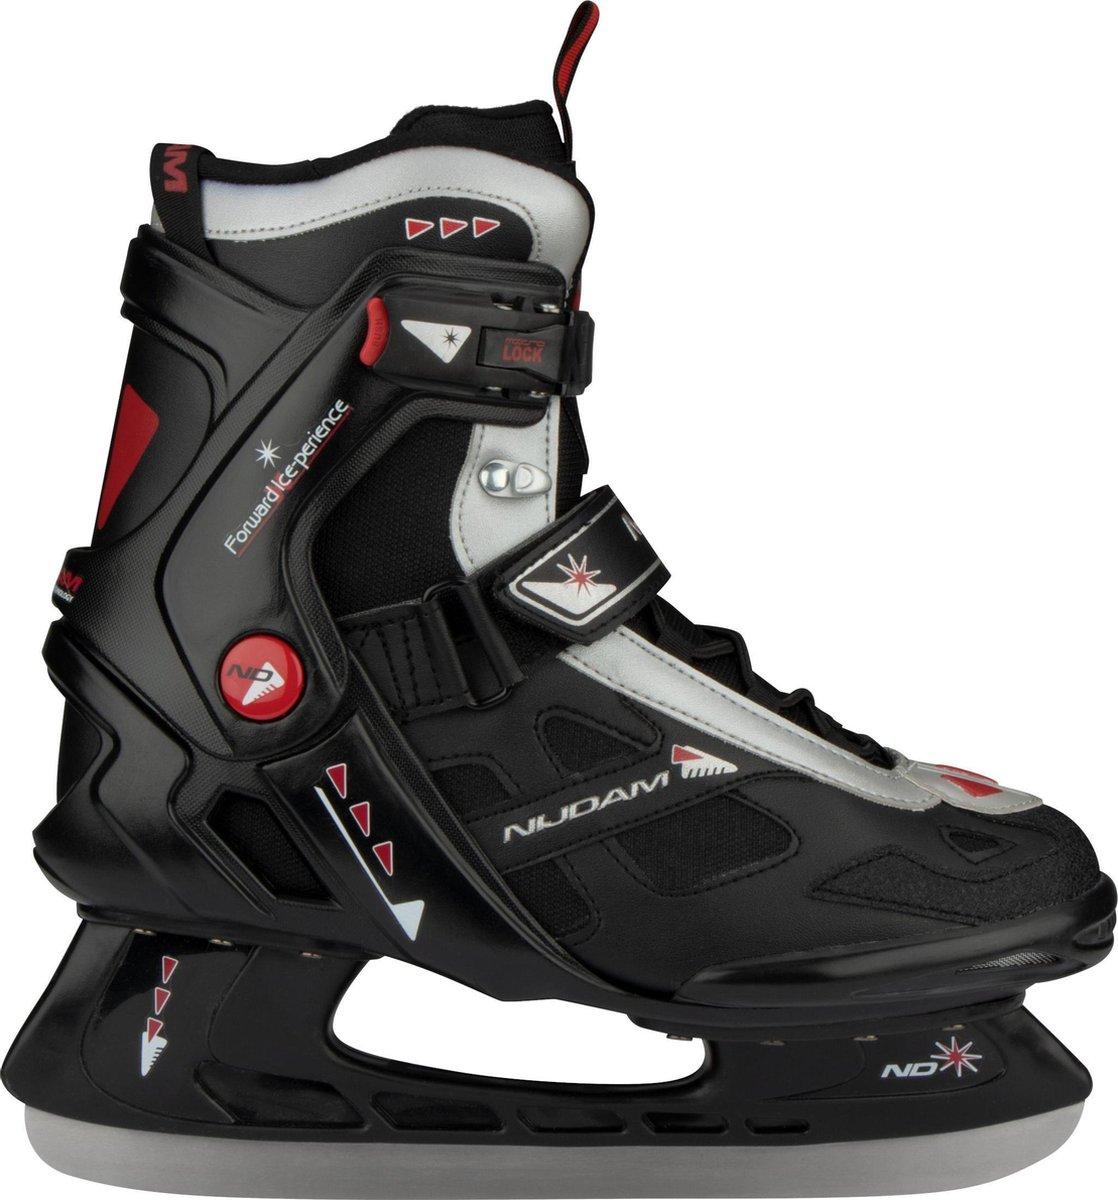 Nijdam IJshockeyschaats - Semi-Softboot - Zwart/Zilver/Rood - 45